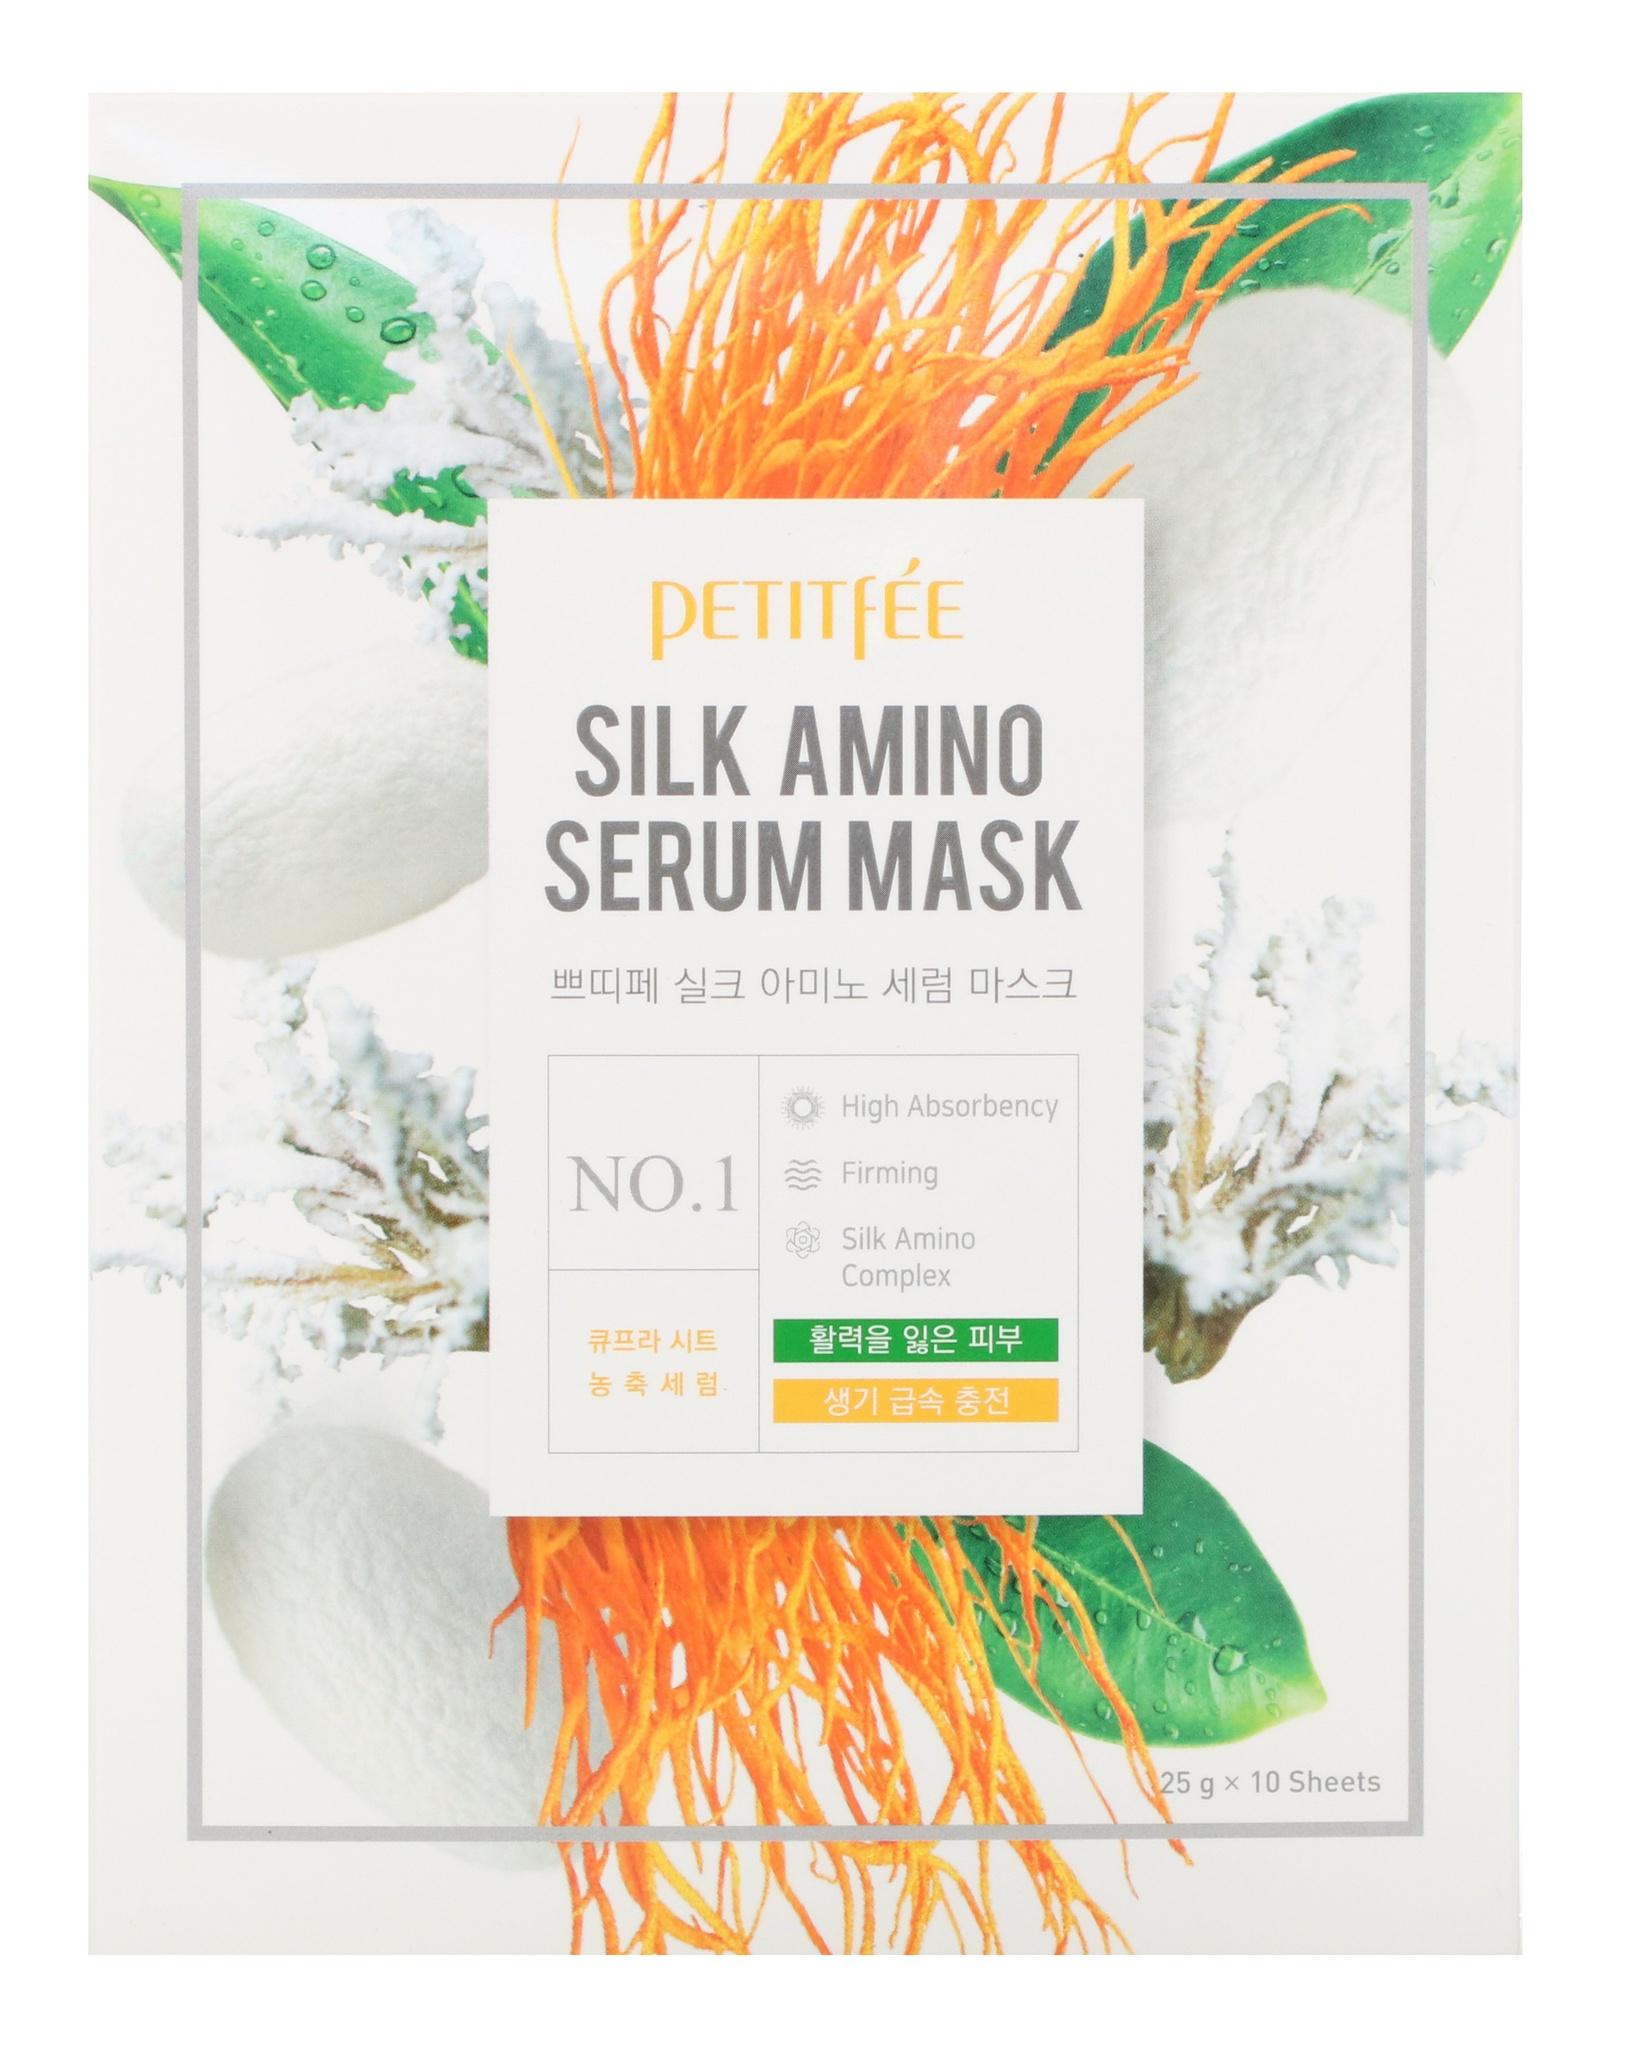 Petitfee Silk Amino Serum Mask